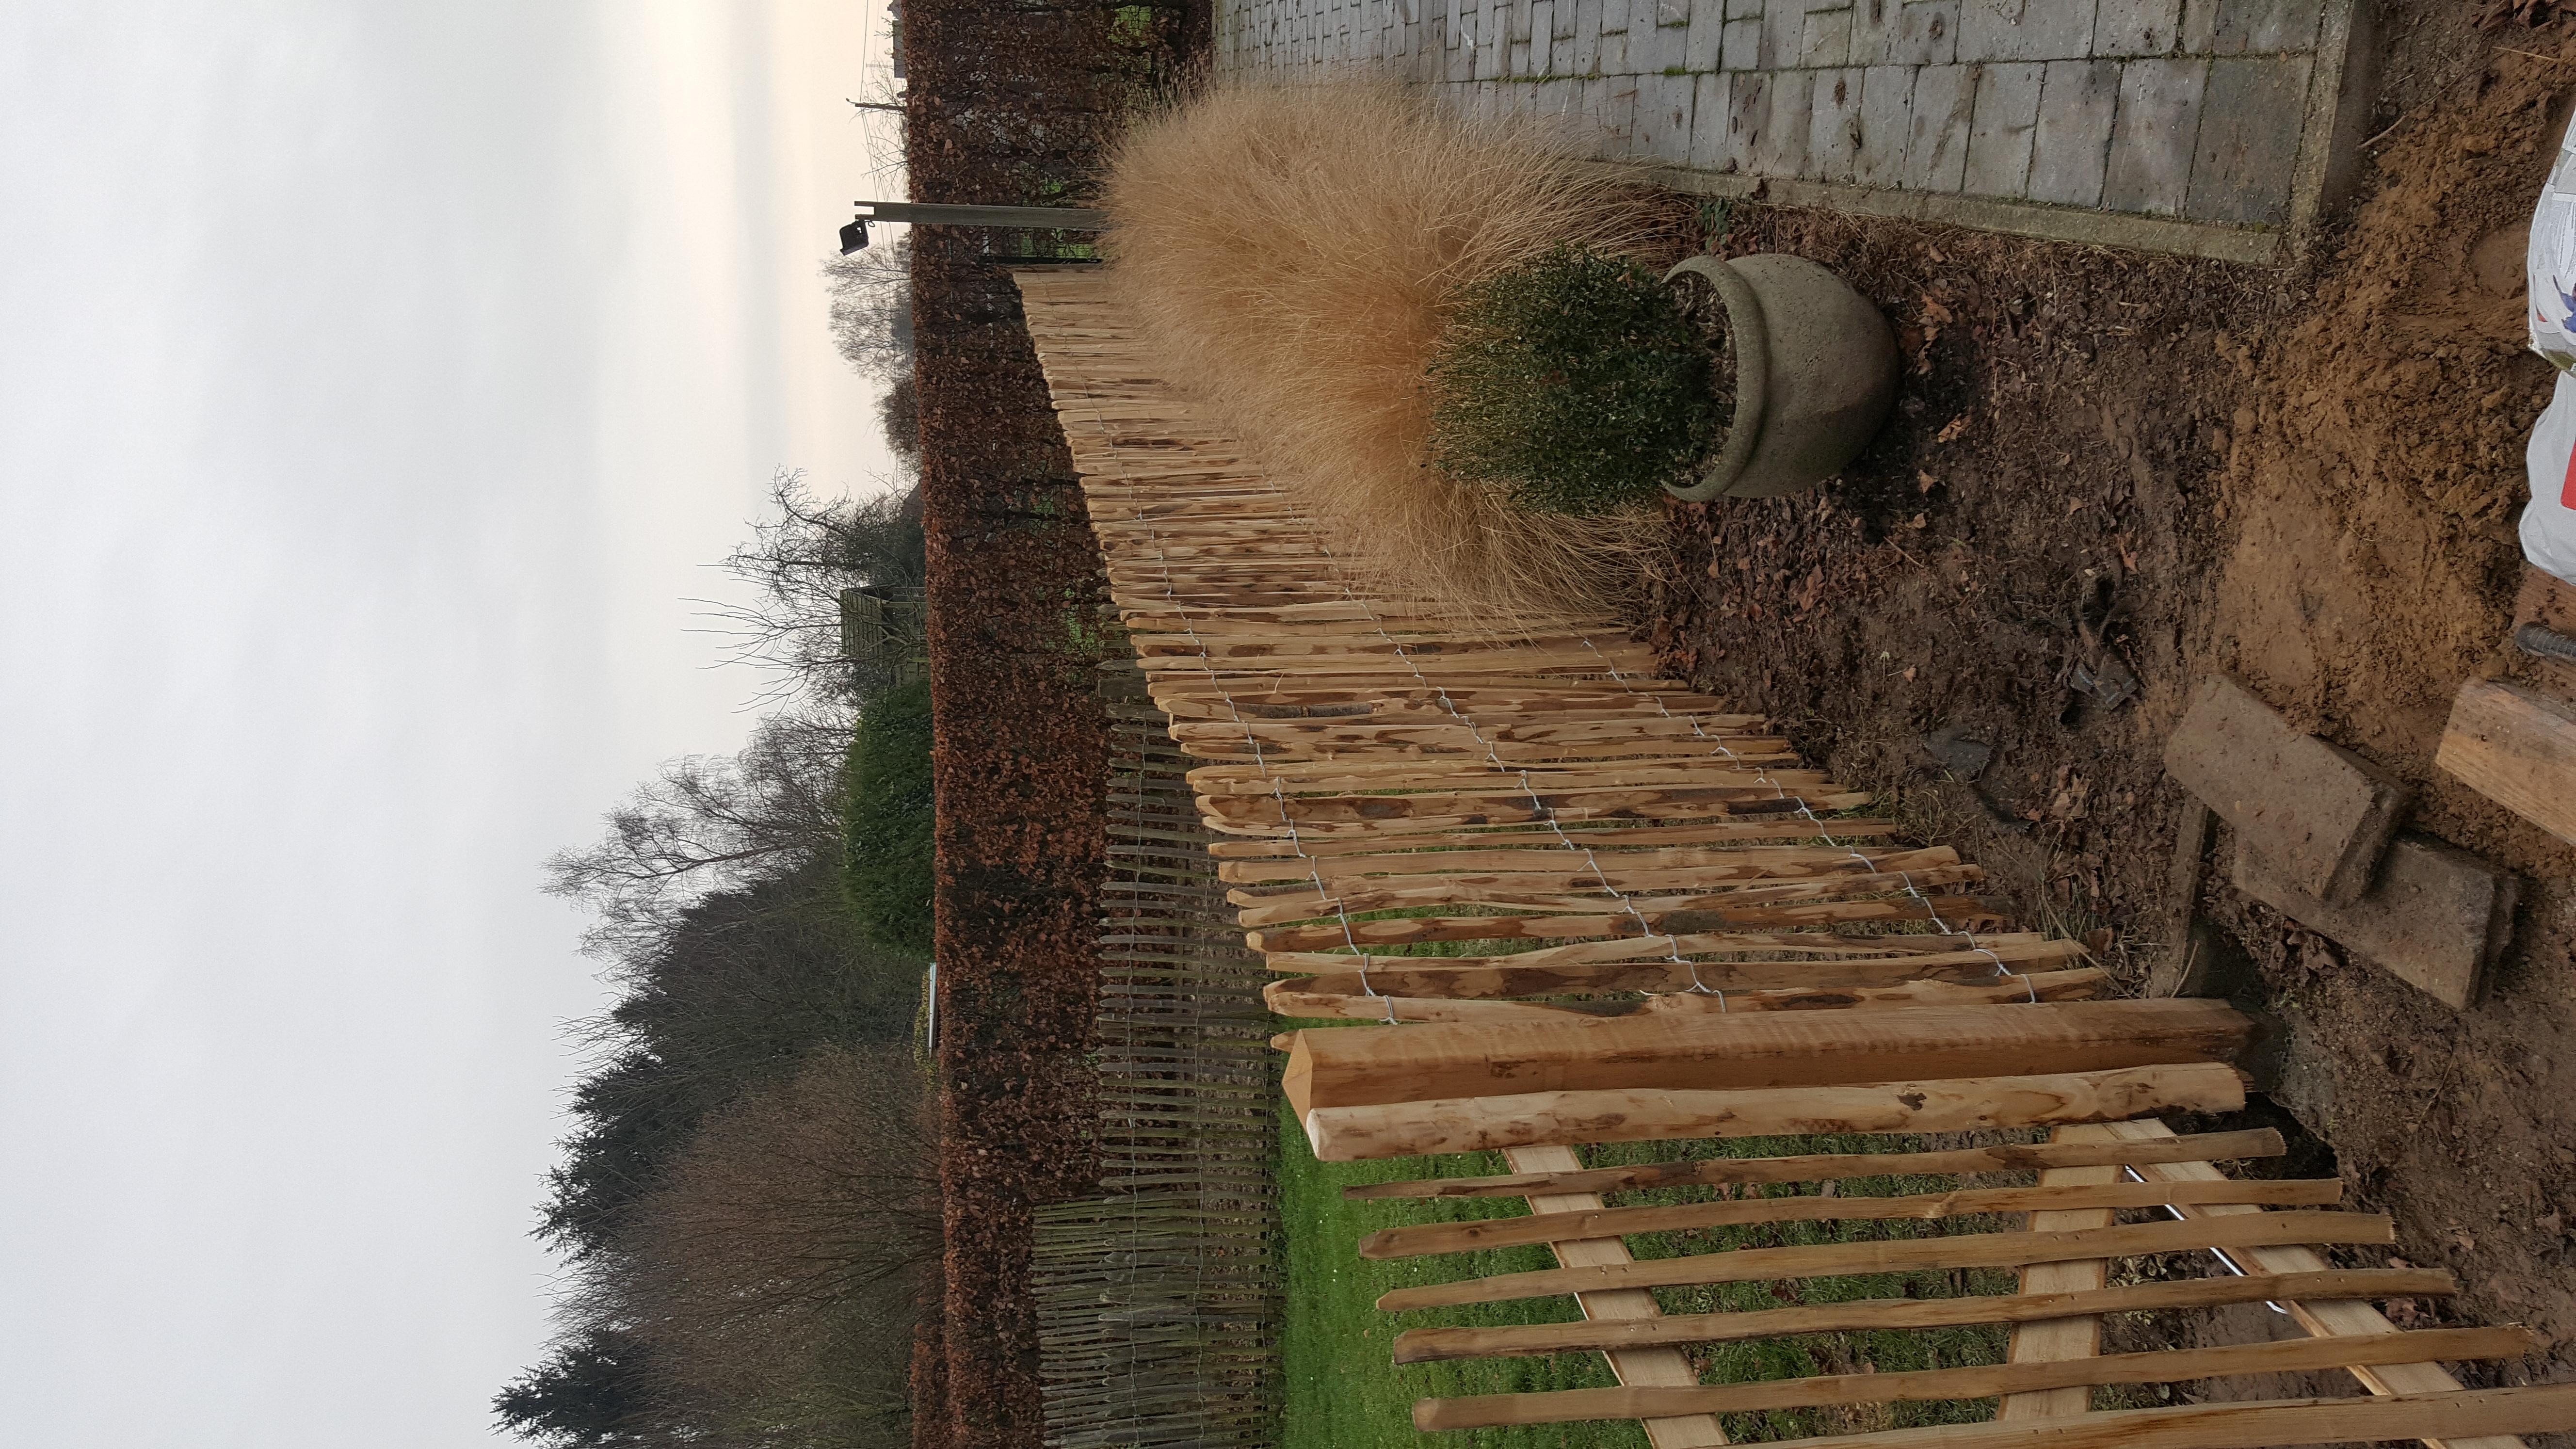 Kastanjehouten omheining + poort